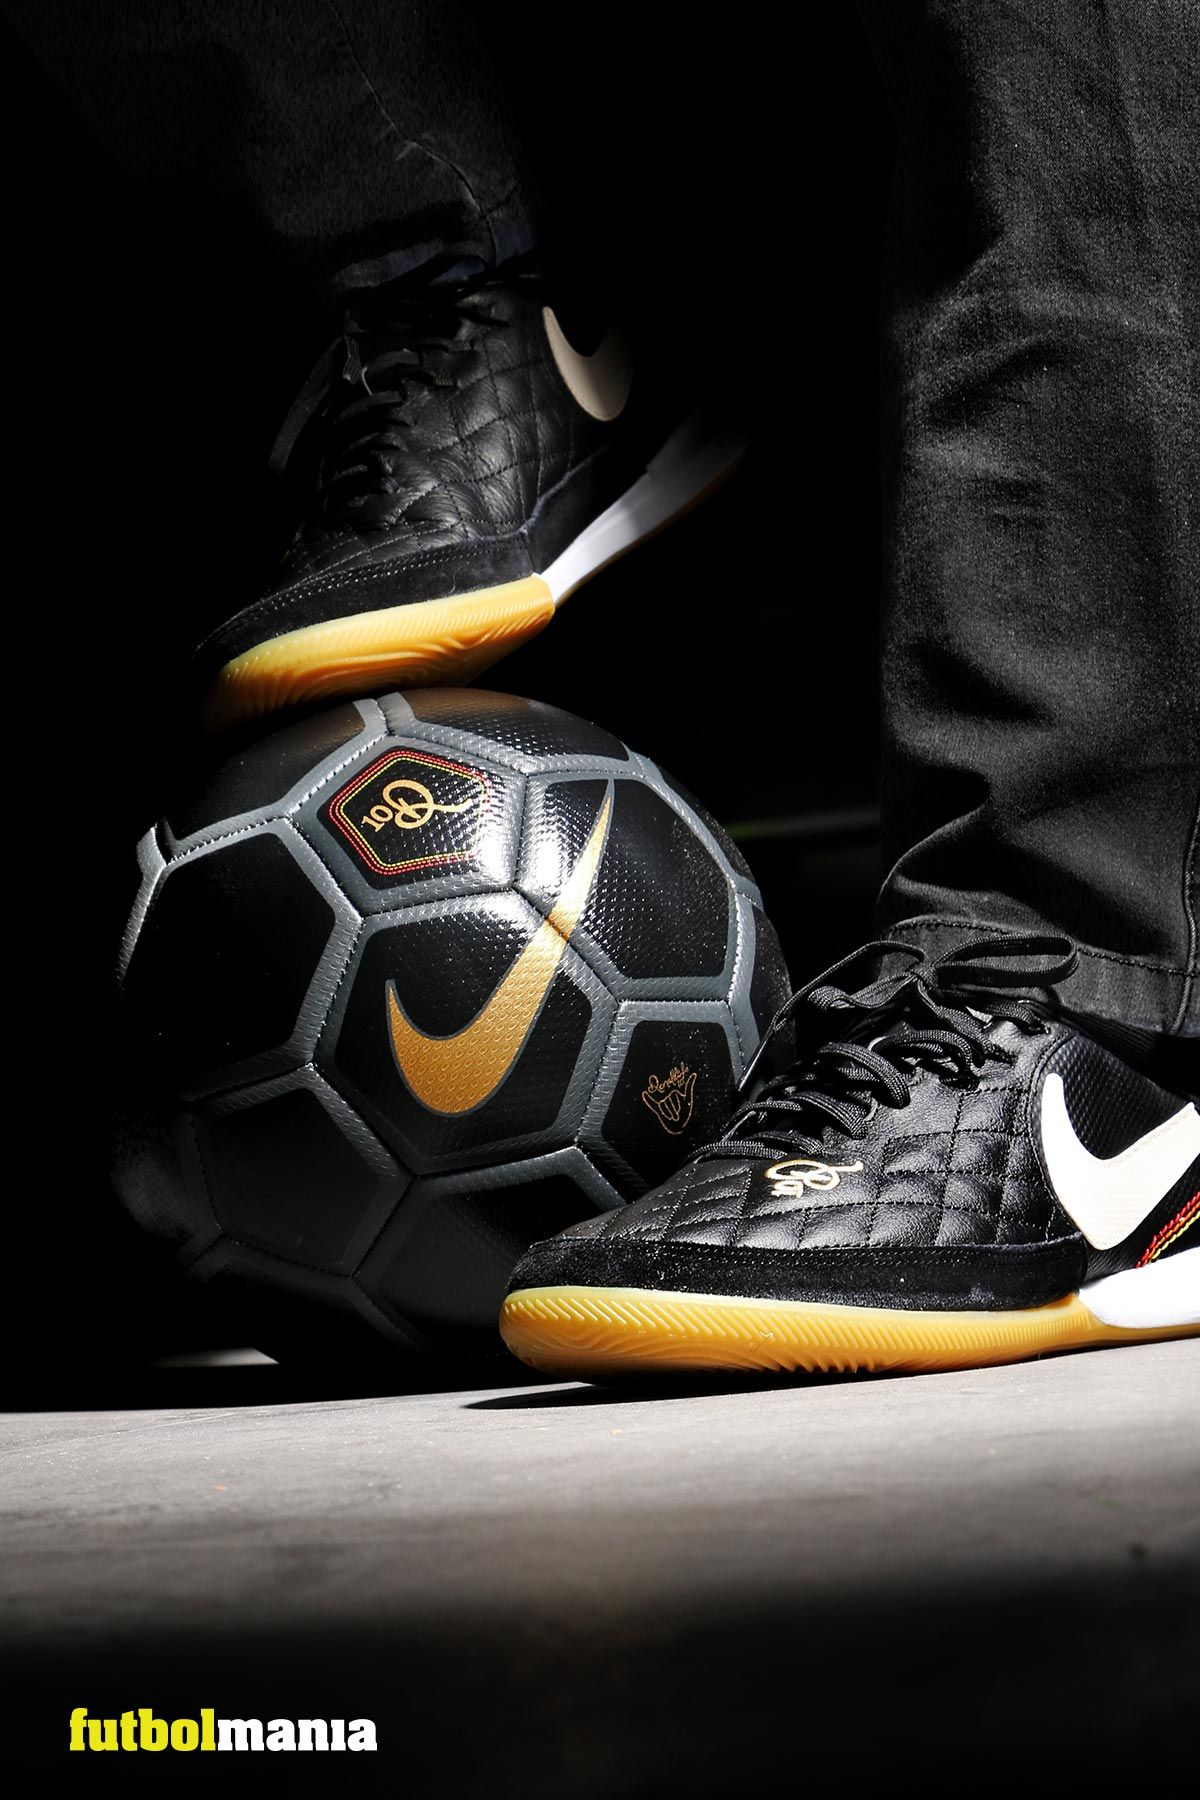 tienda de liquidación la mejor moda precios baratass Pin de Johan presinal en Football boots | Balón de fútbol ...